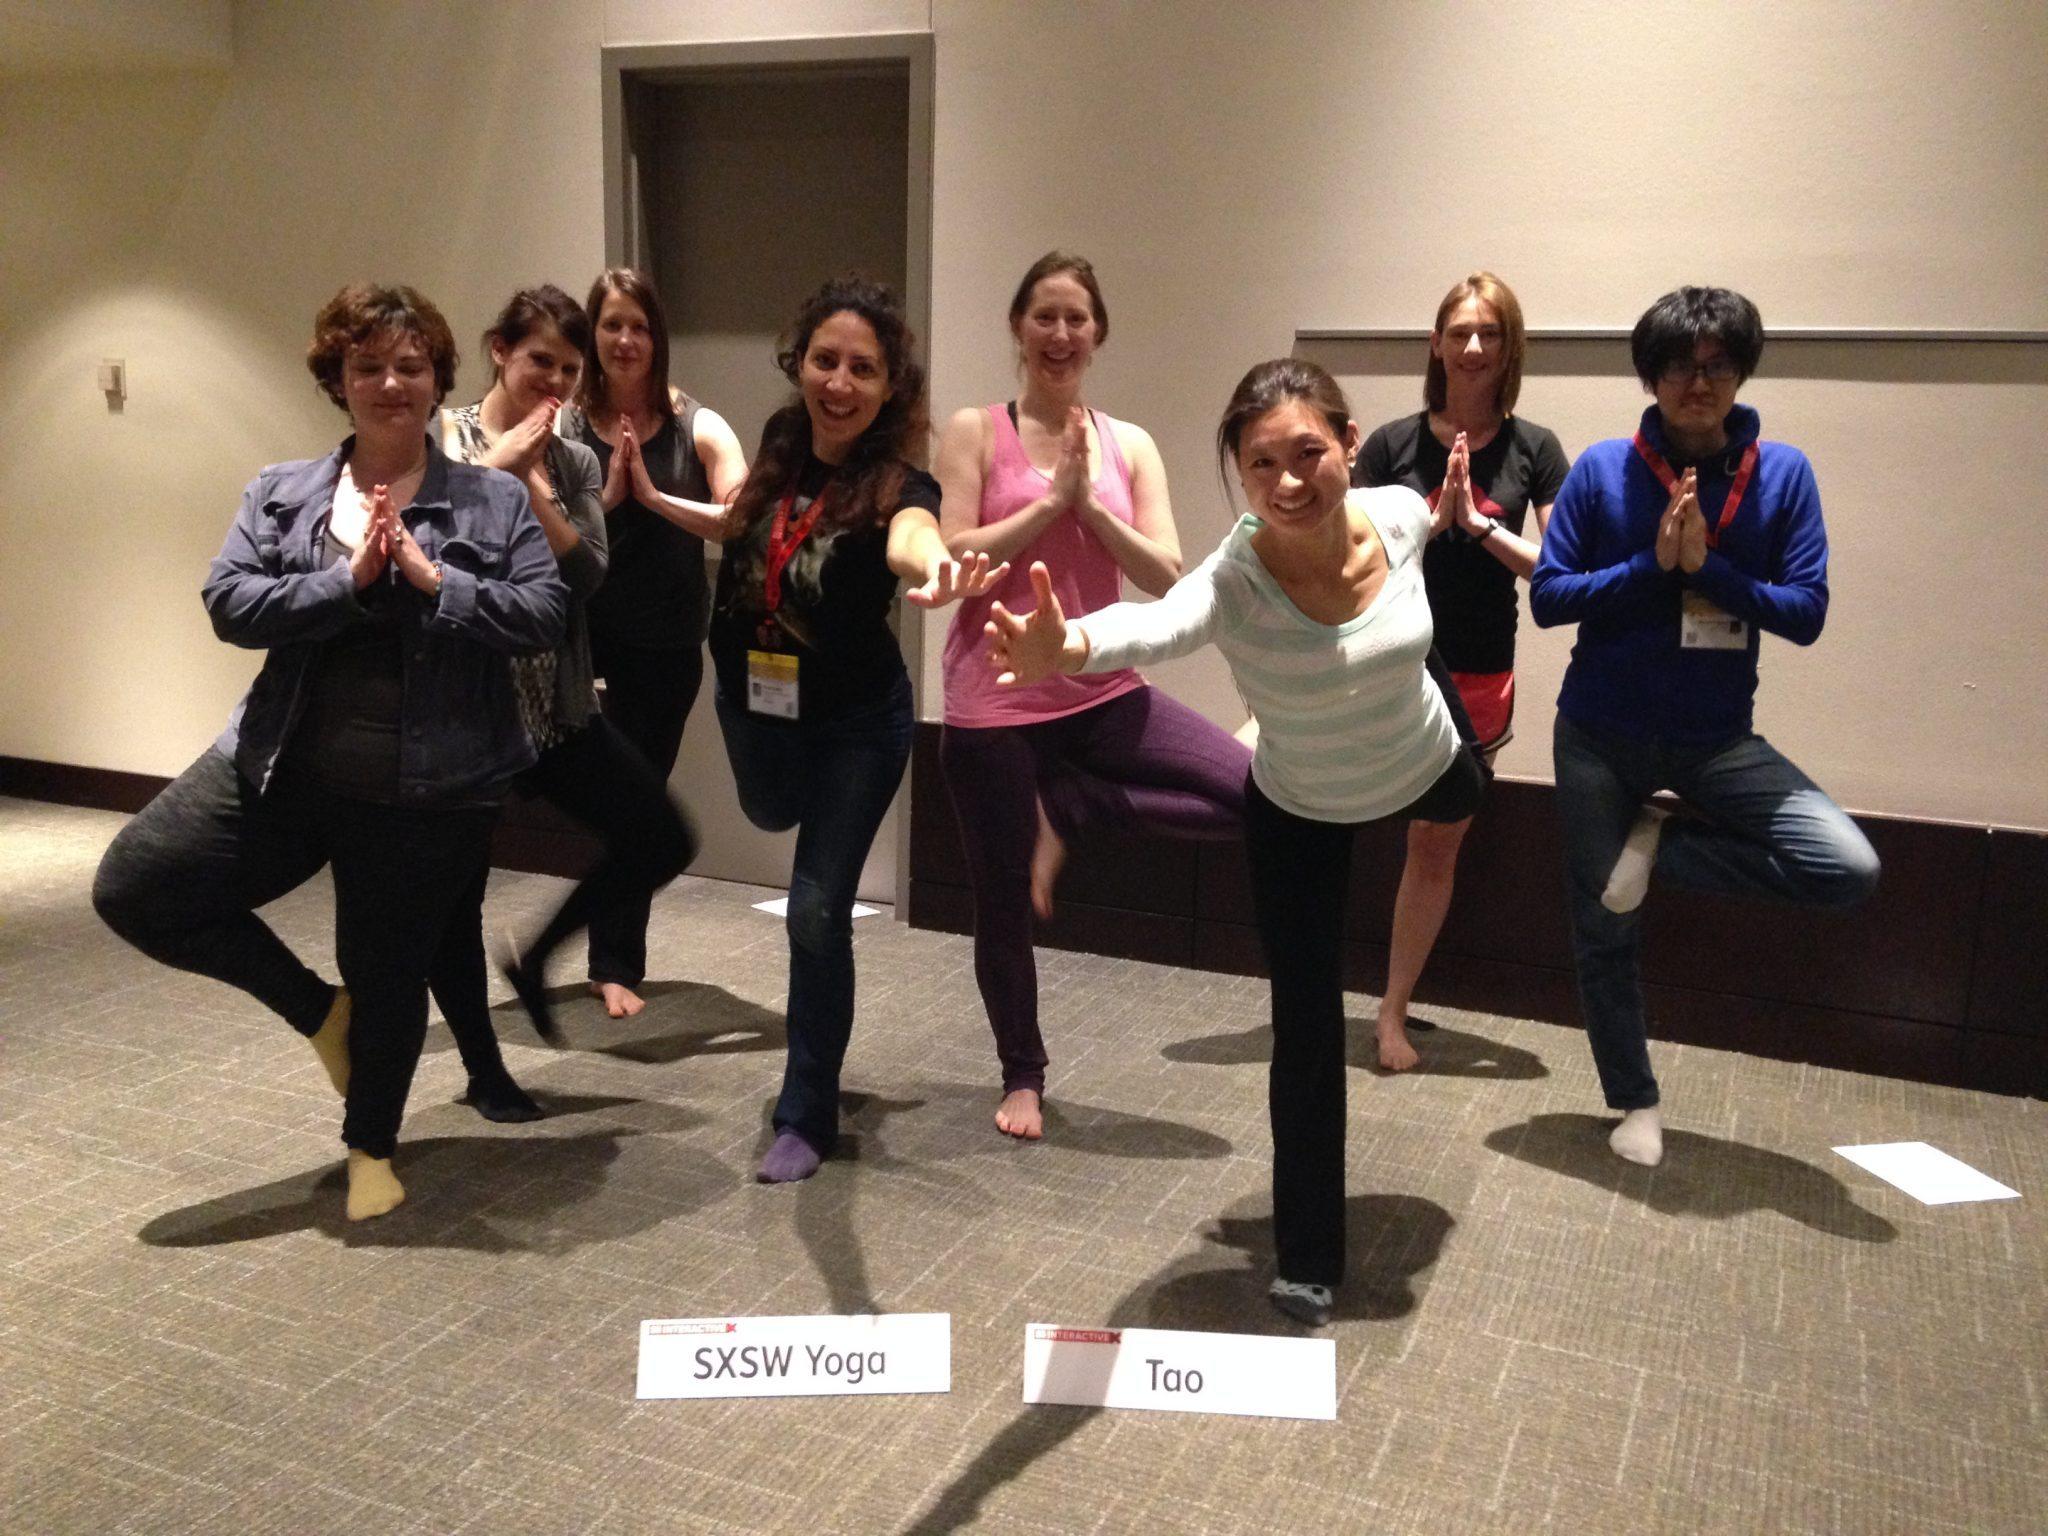 SXSW Yoga with Melodie Tao